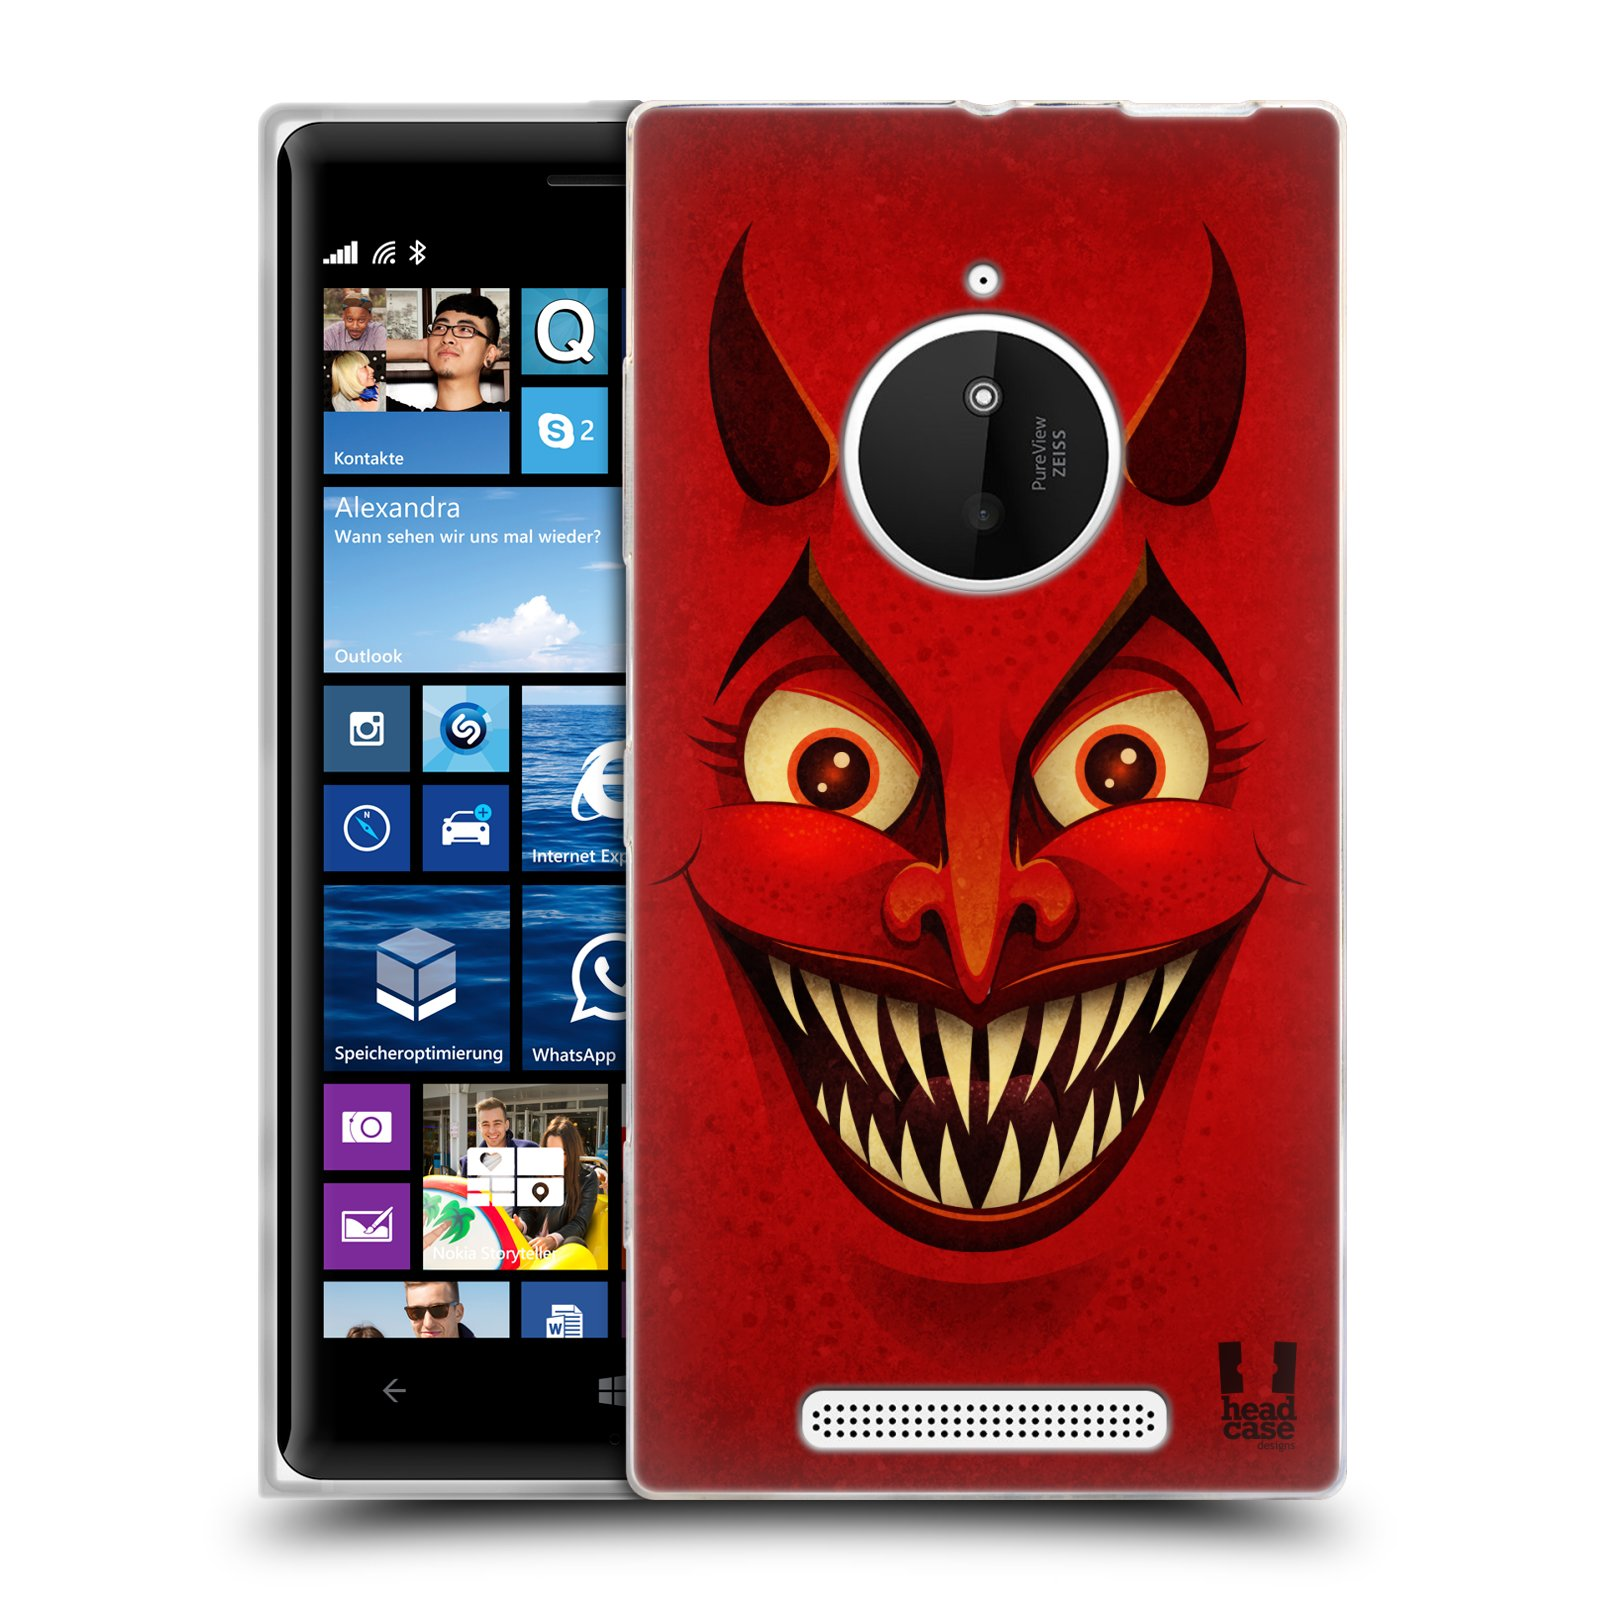 Silikonové pouzdro na mobil Nokia Lumia 830 HEAD CASE ČERT (Silikonový kryt či obal na mobilní telefon Nokia Lumia 830)